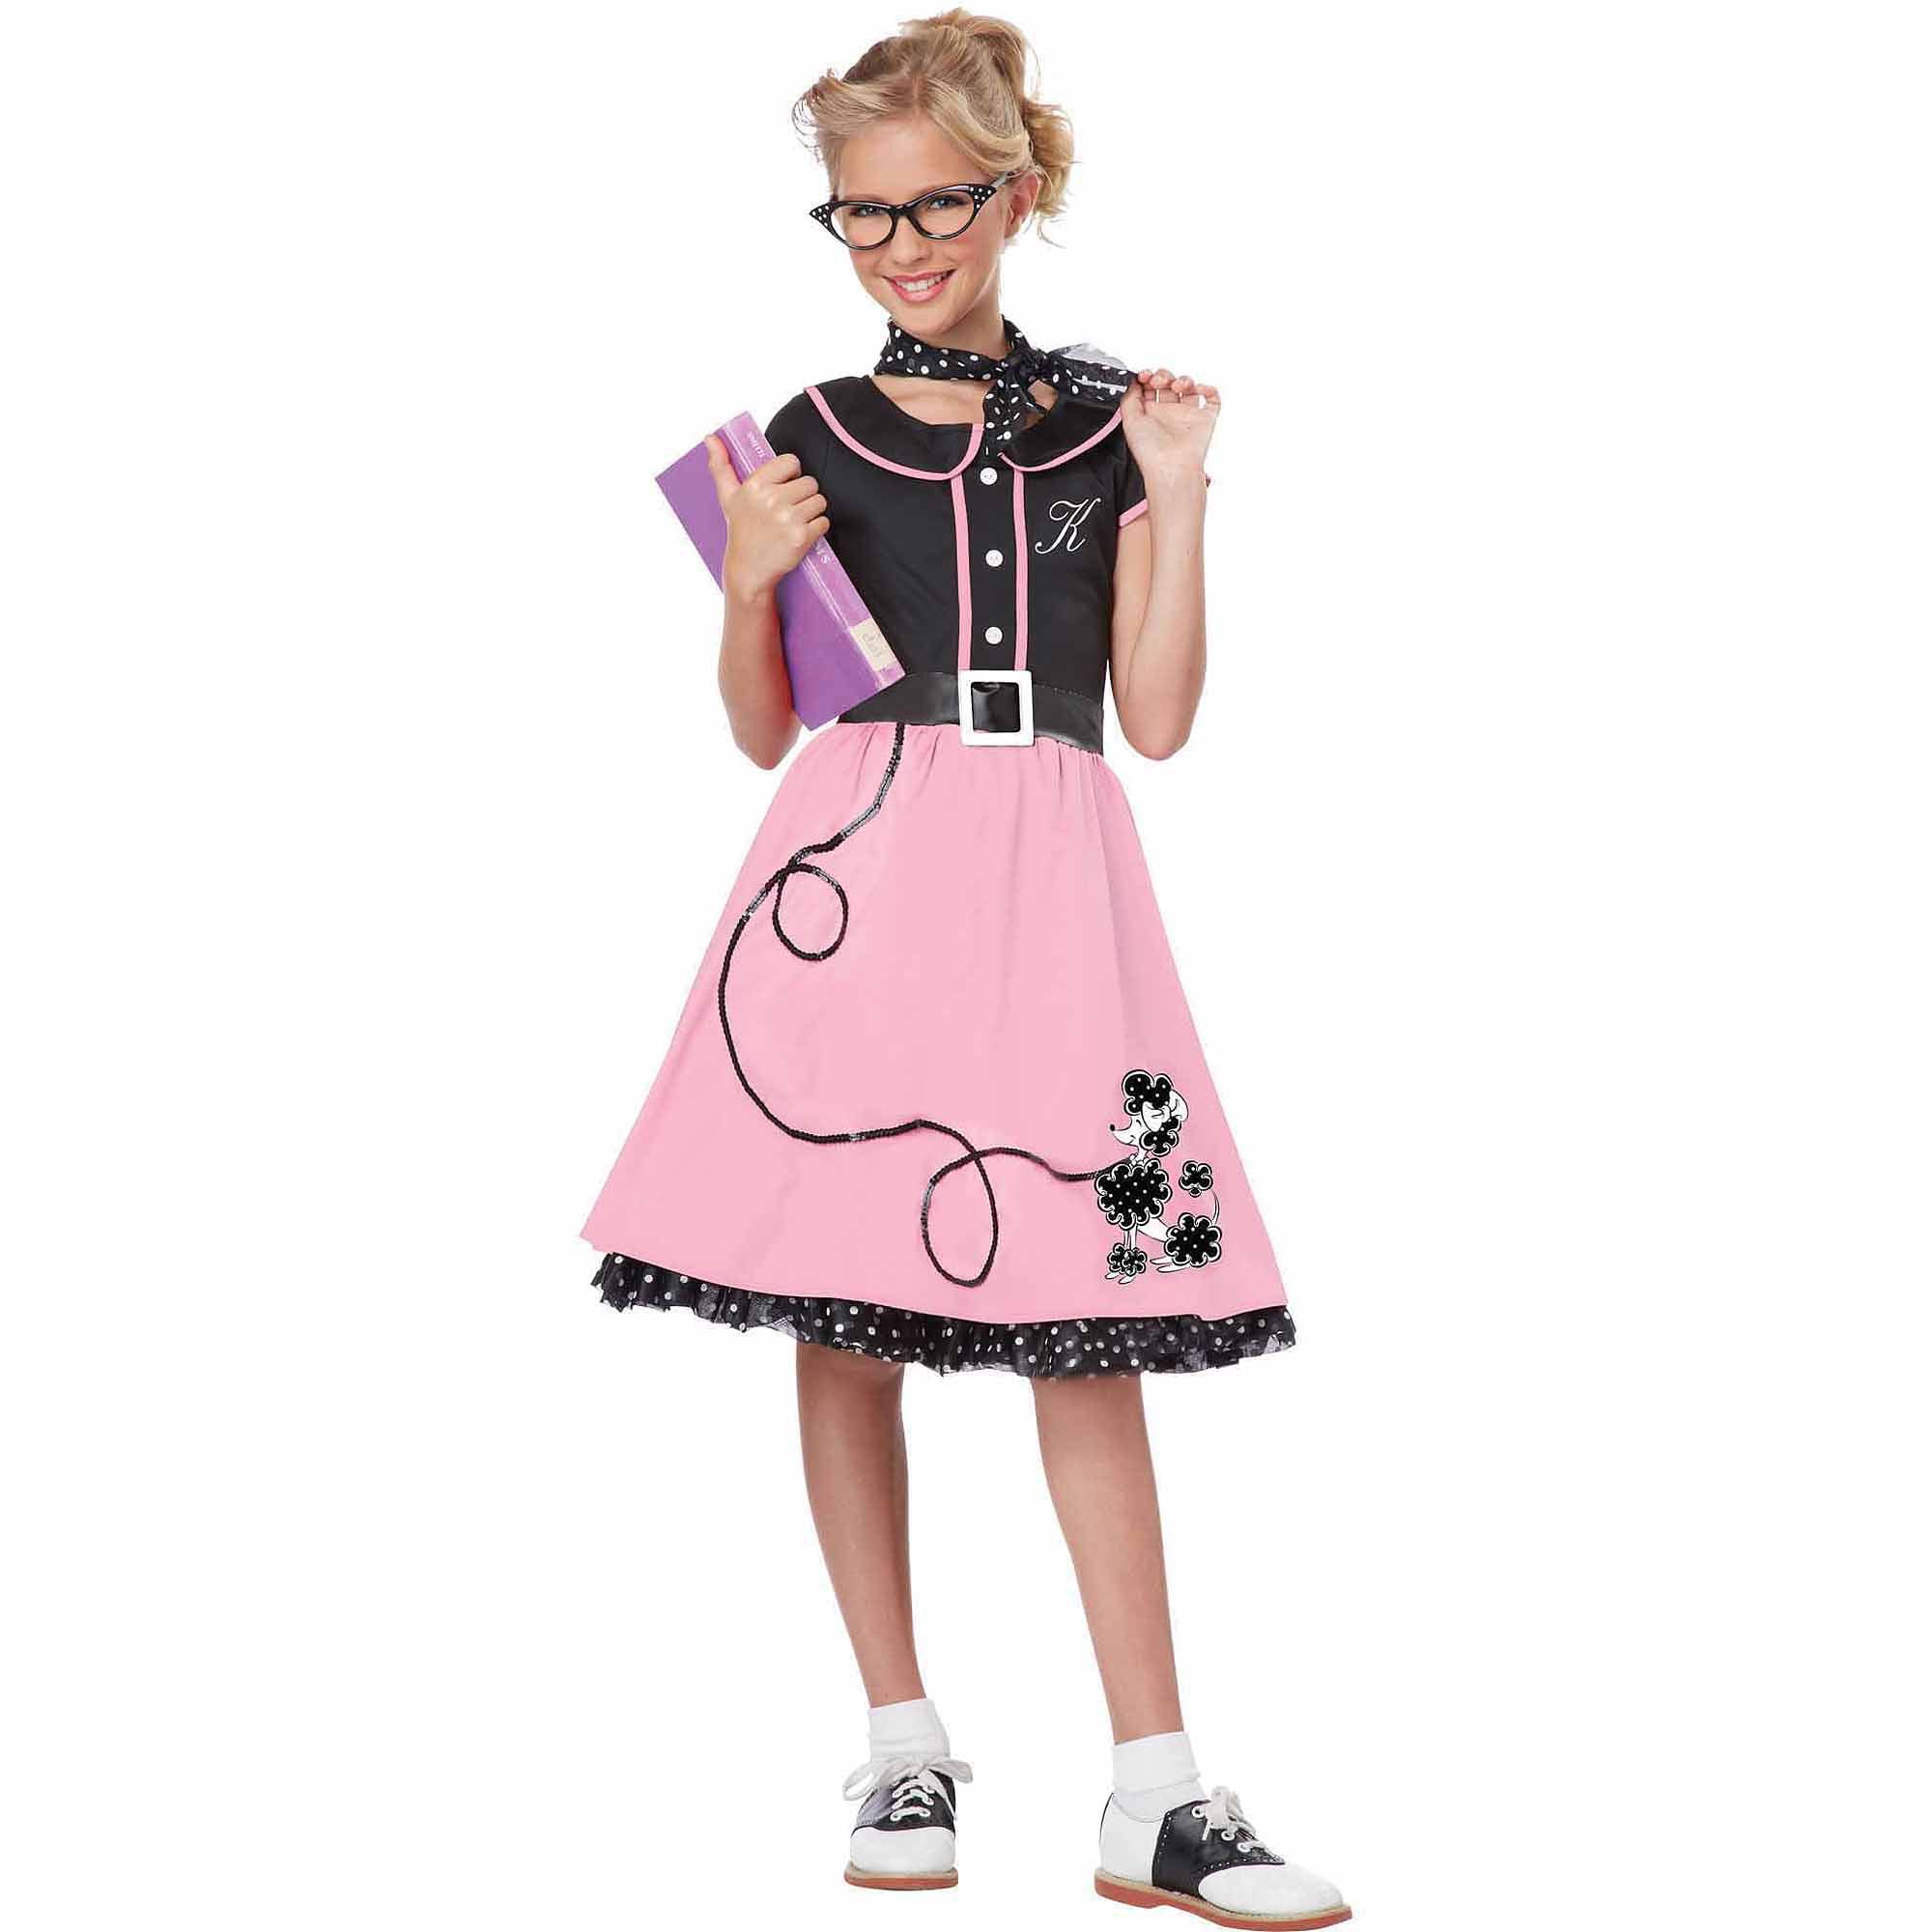 50s Sweetheart Child Halloween Costume - Walmart.com